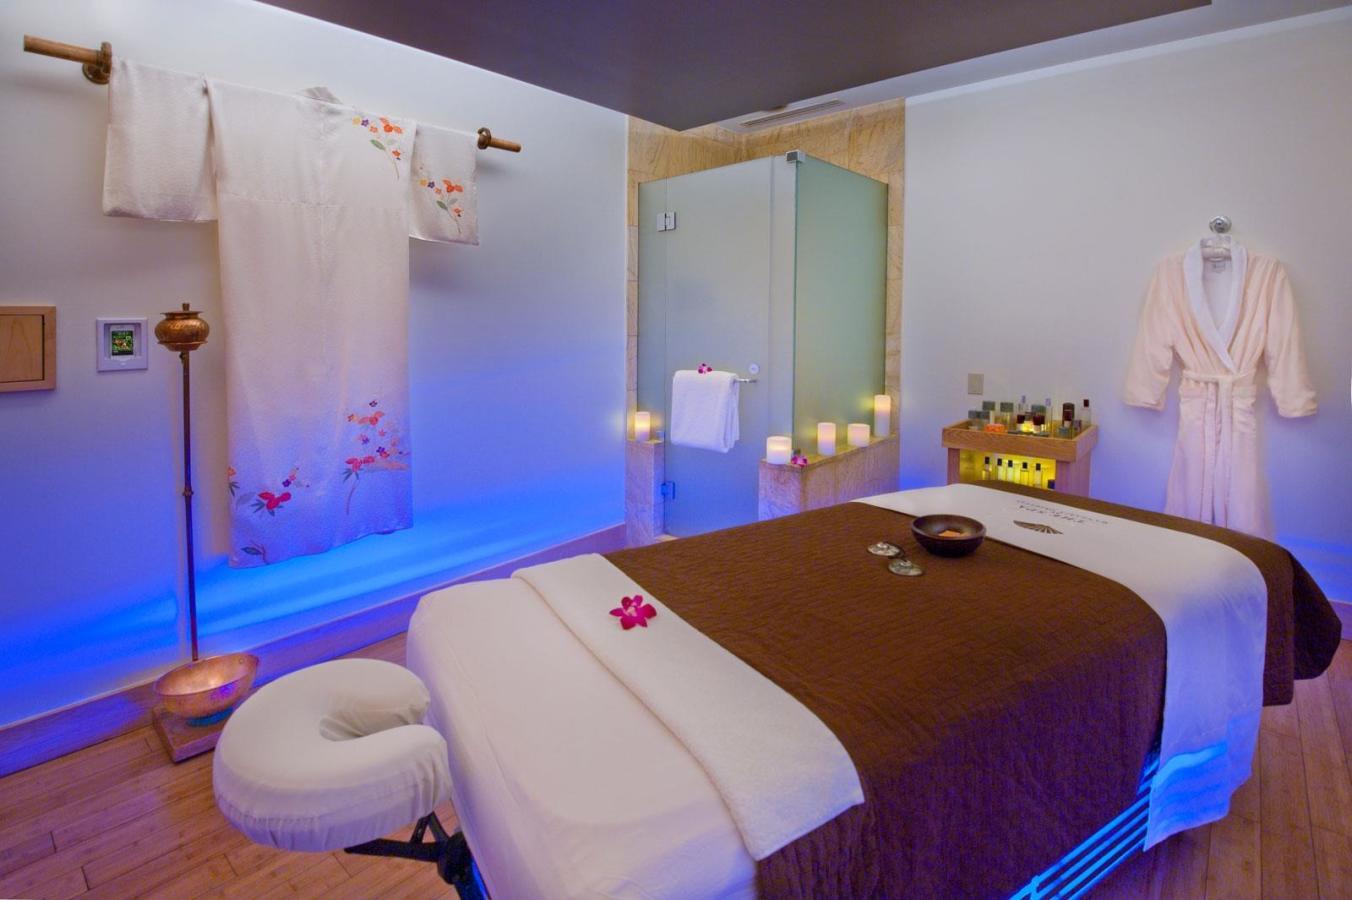 Spa Suite at The Spa at Mandarin Oriental, Miami